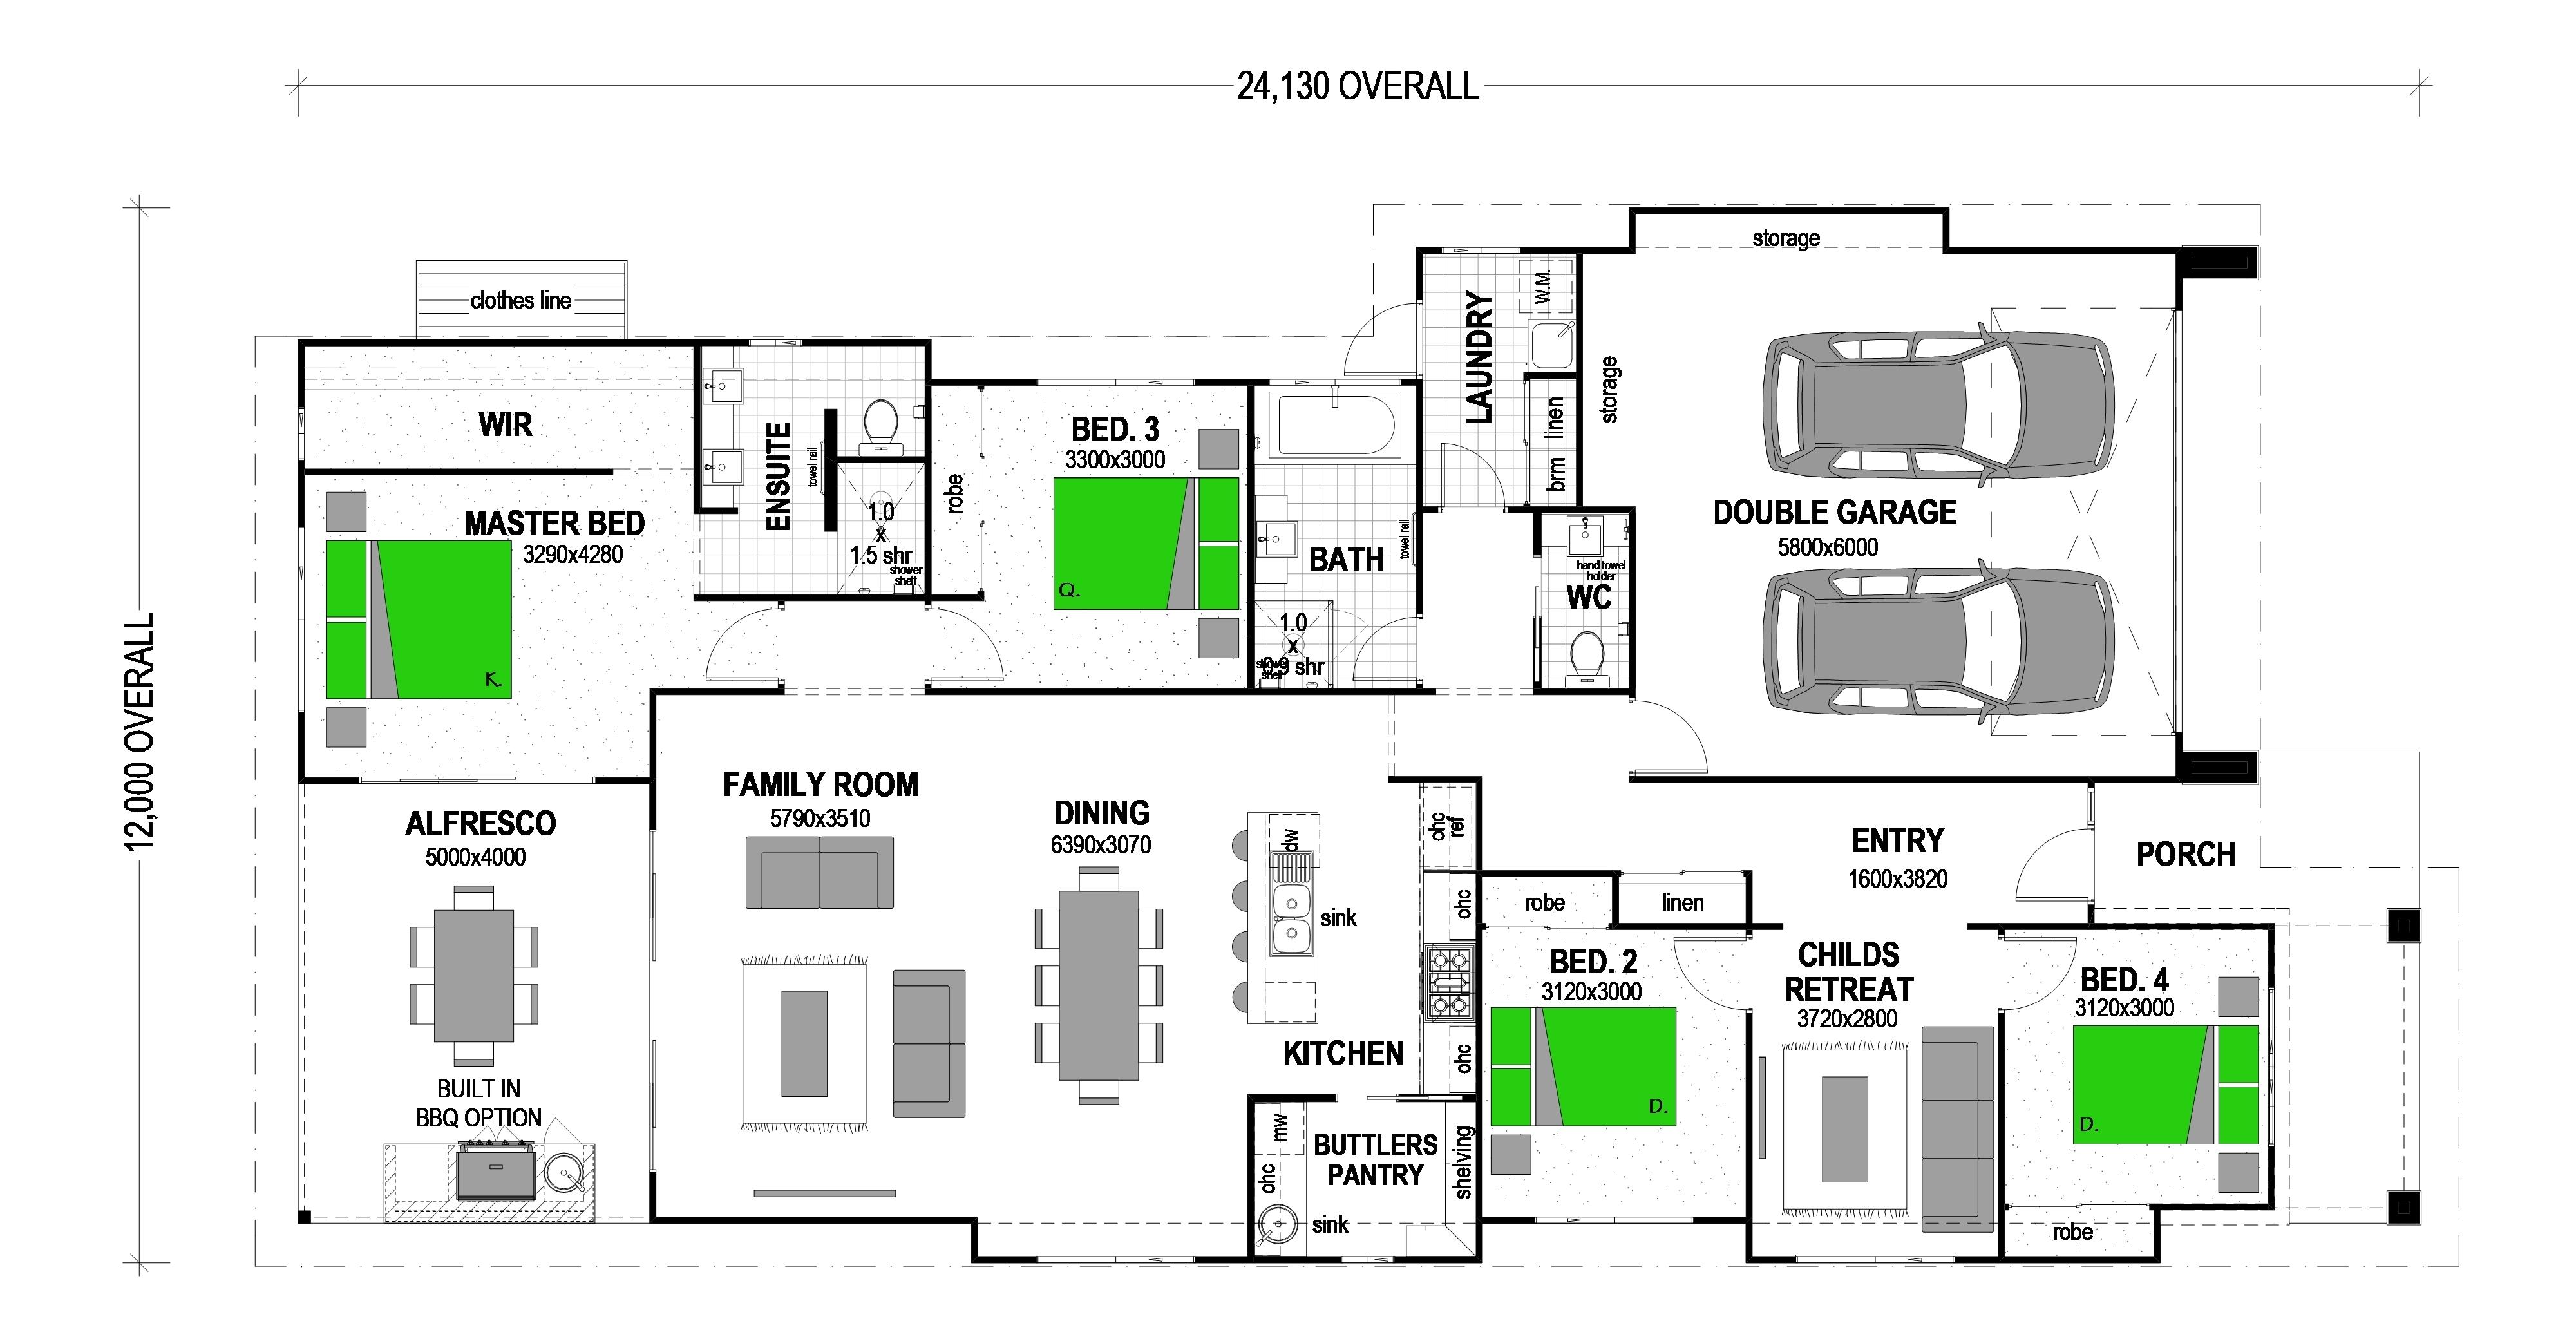 16 SLOAN SQUARE DROUIN SOUTH Floorplan